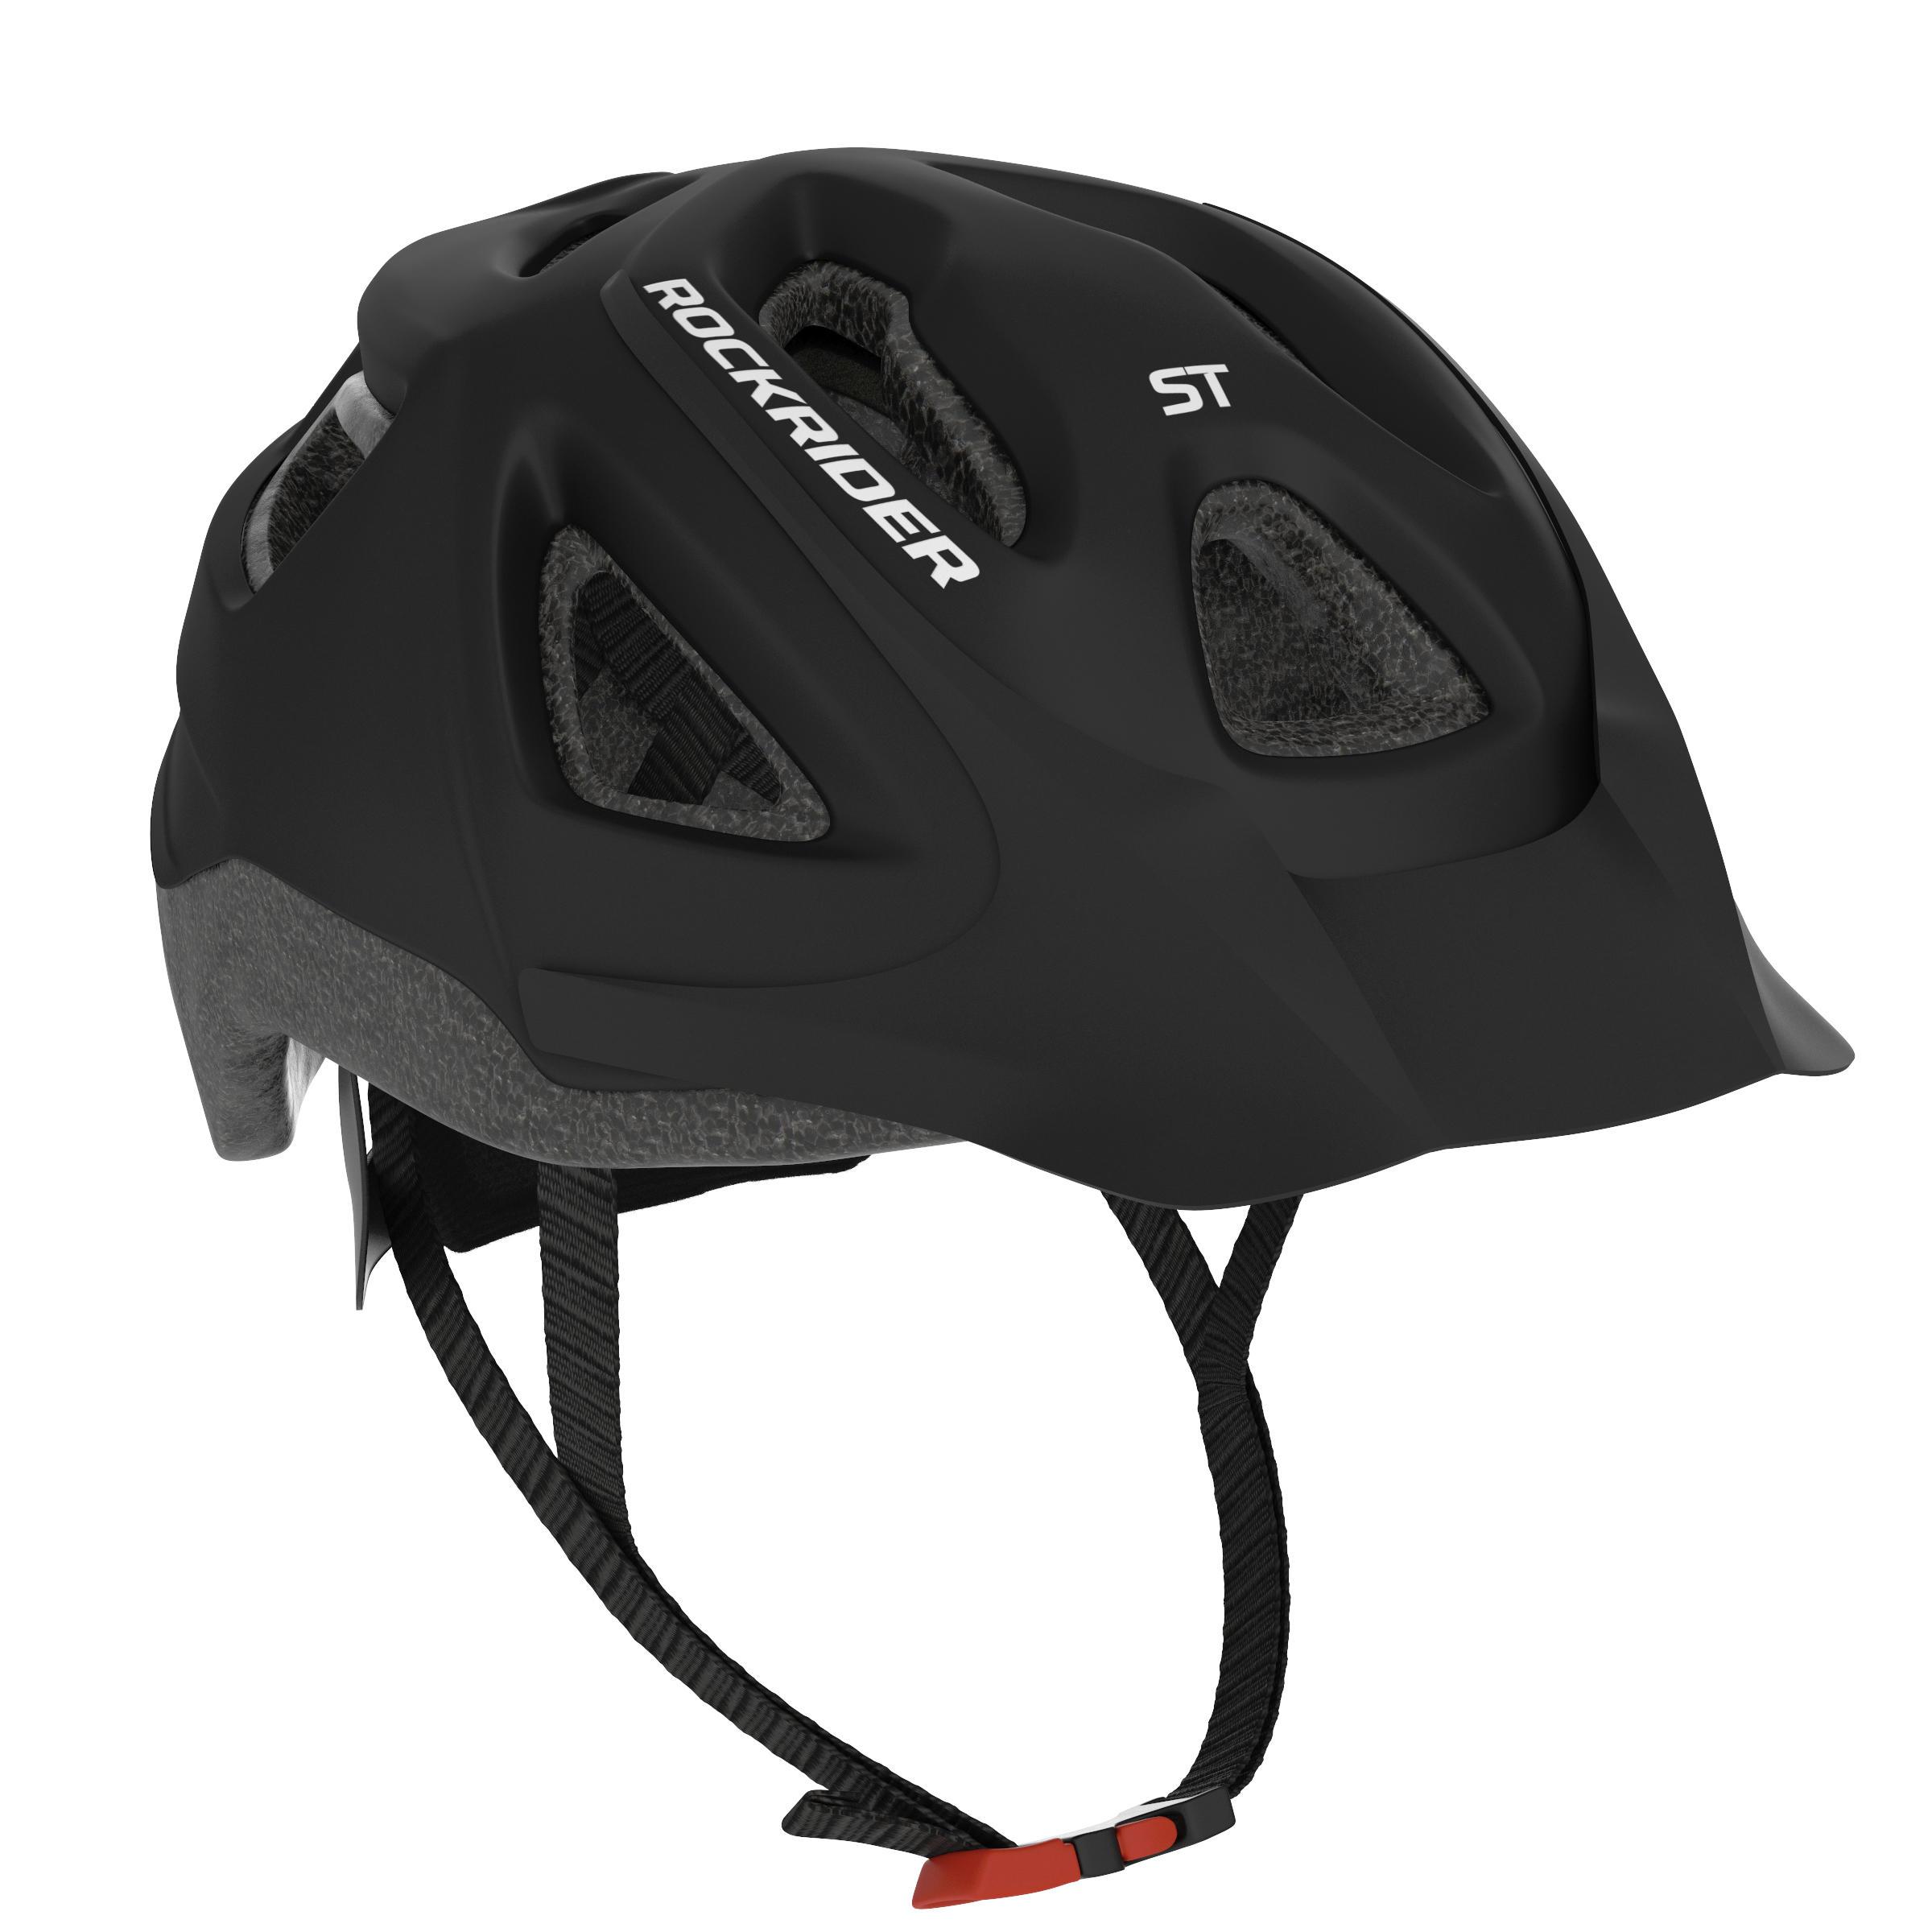 Rockrider MTB-helm ST 100 zwart kopen